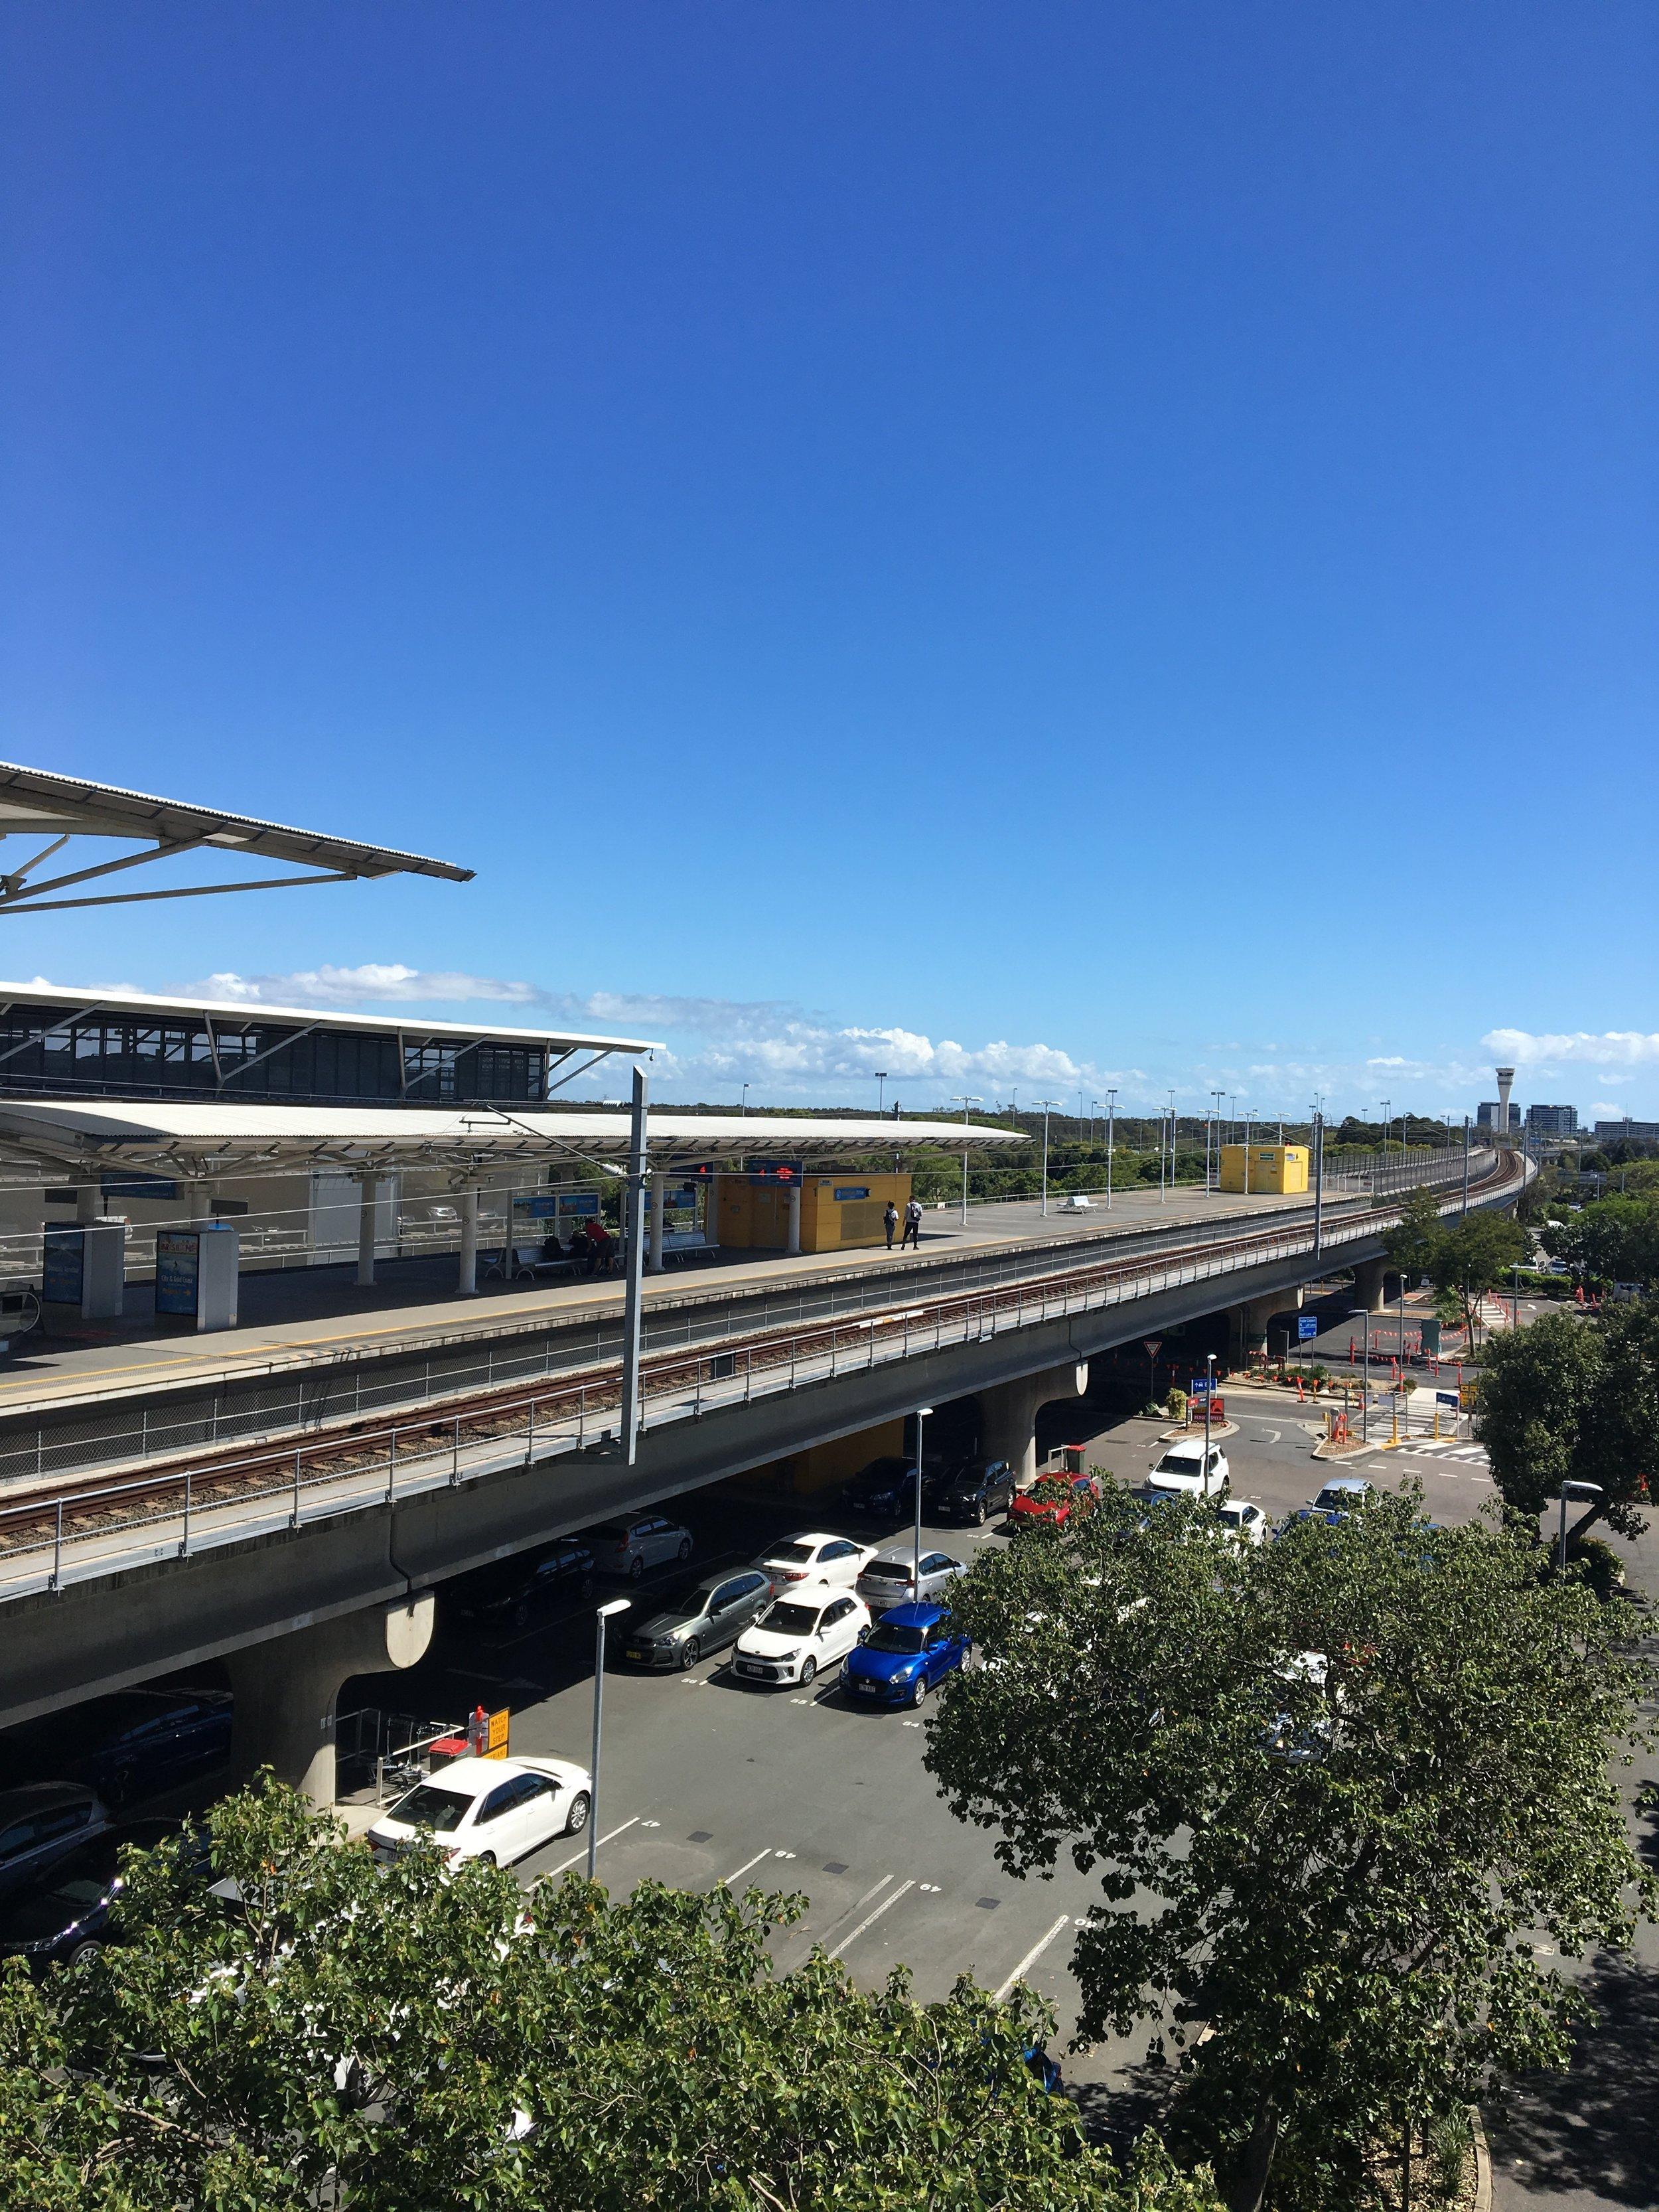 australia-brisbane-airport-train